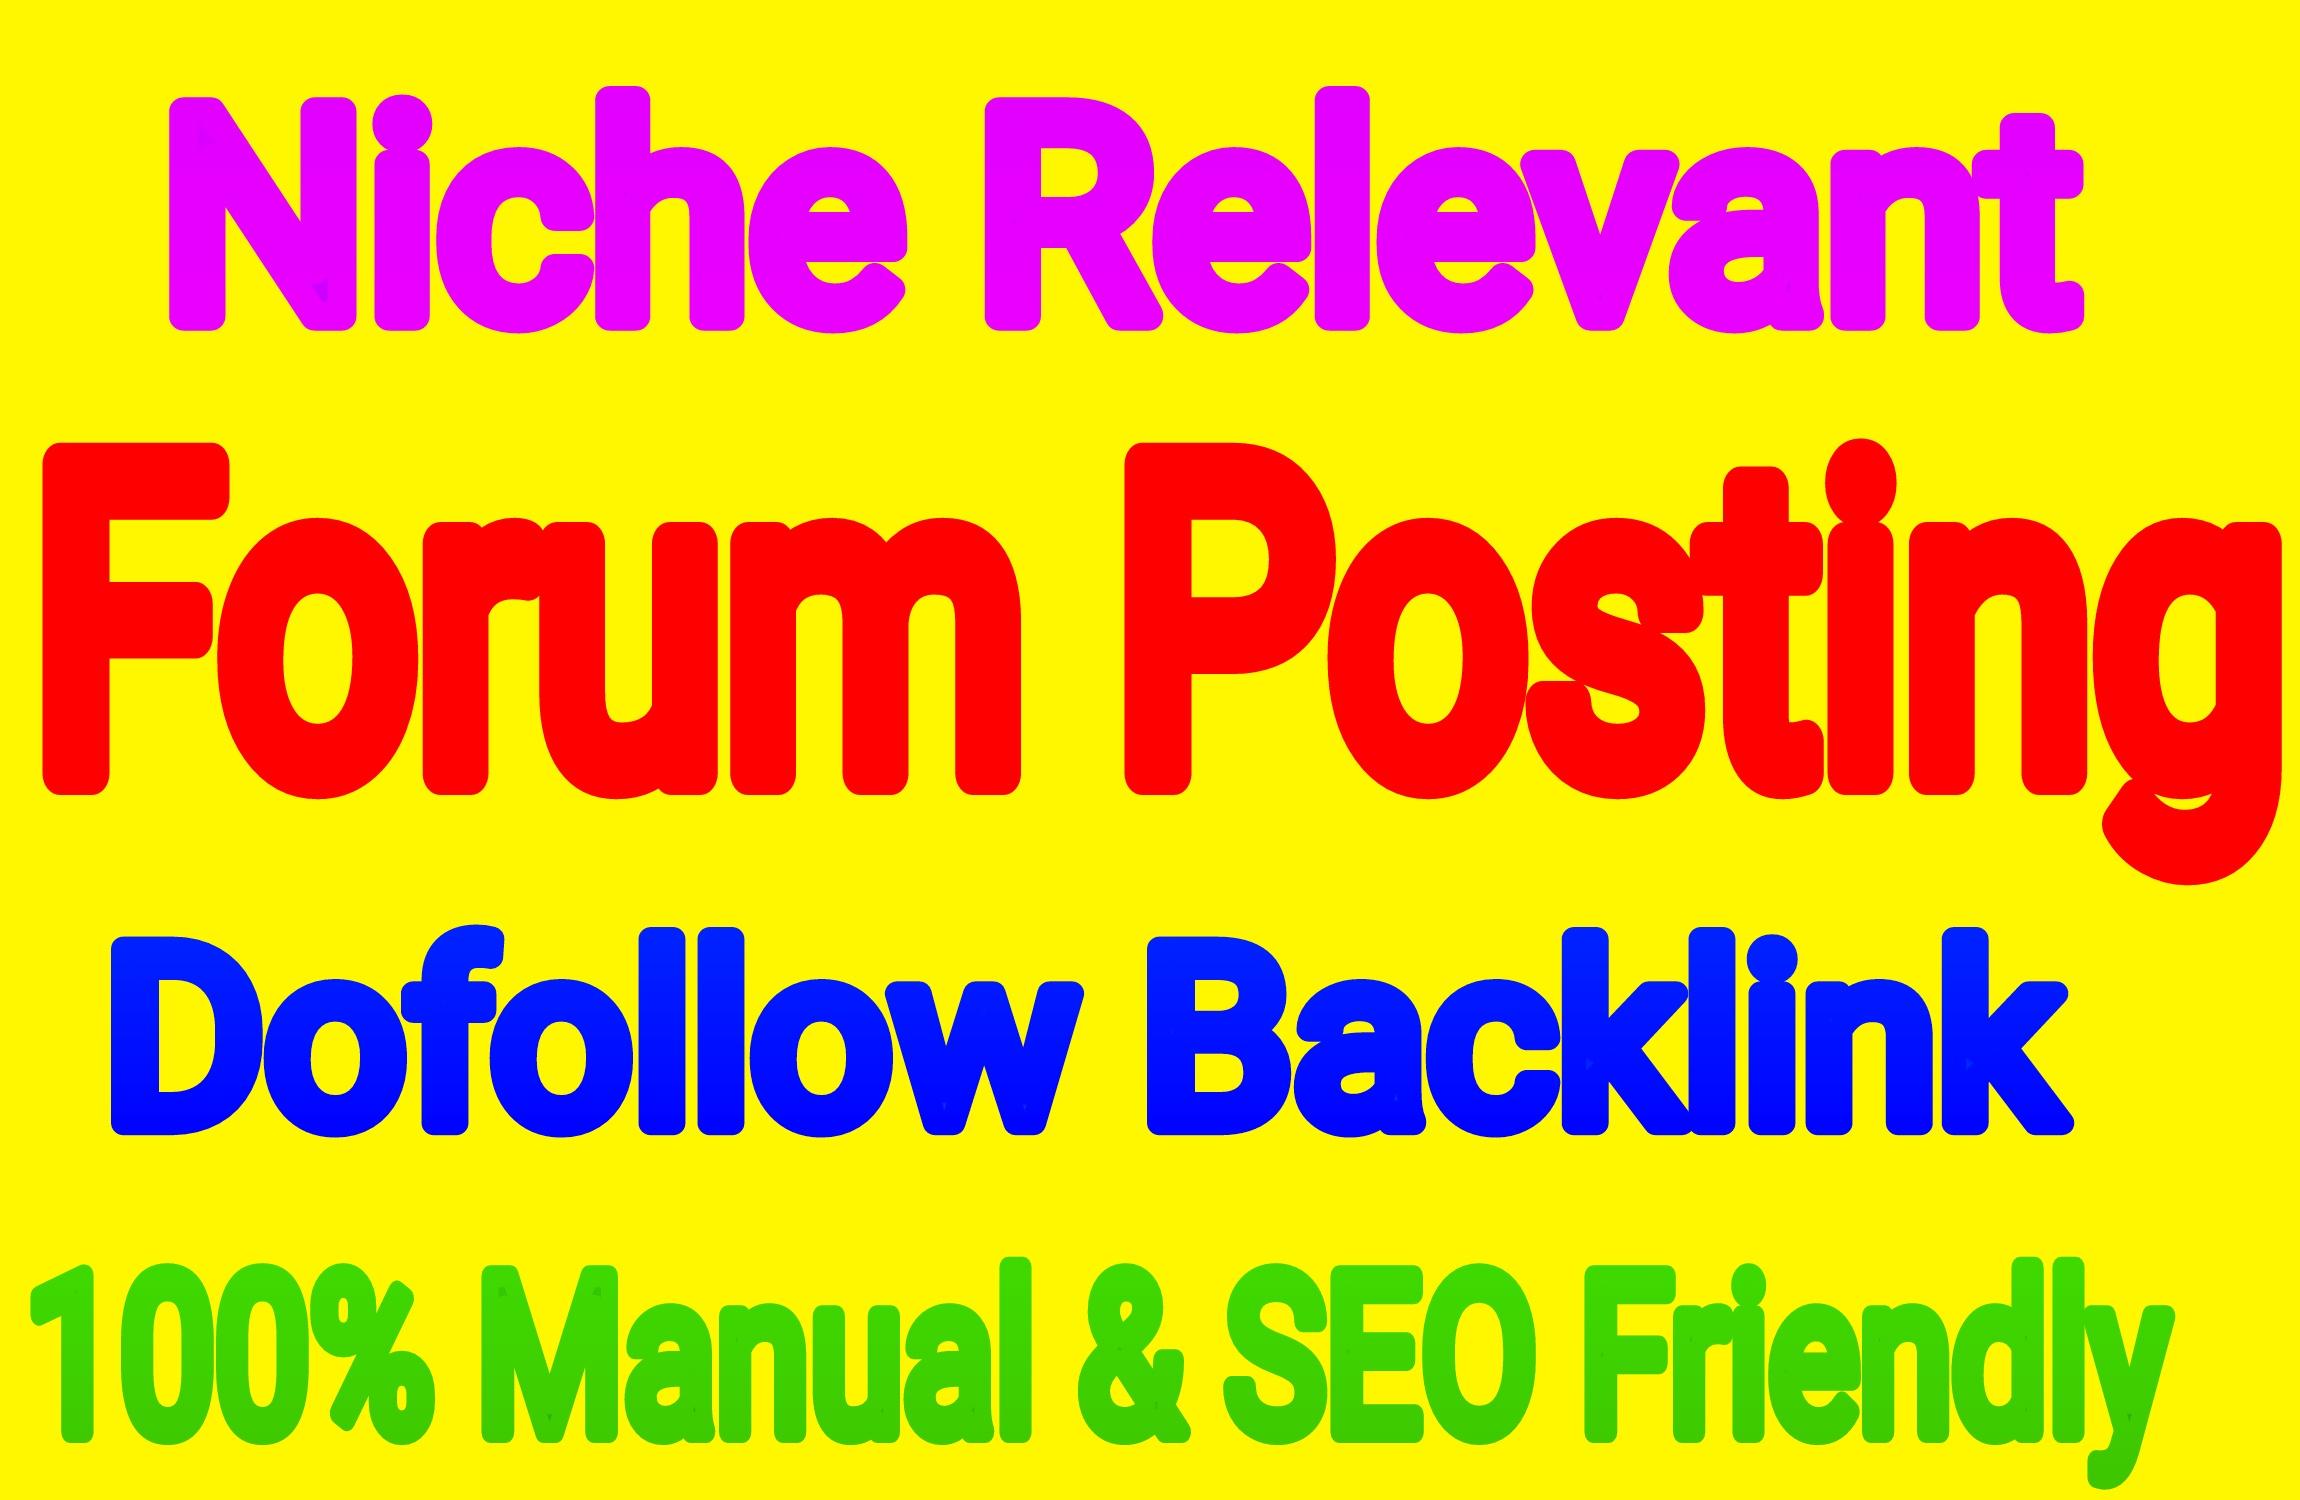 30 Forum Posting Backlinks Service Providing